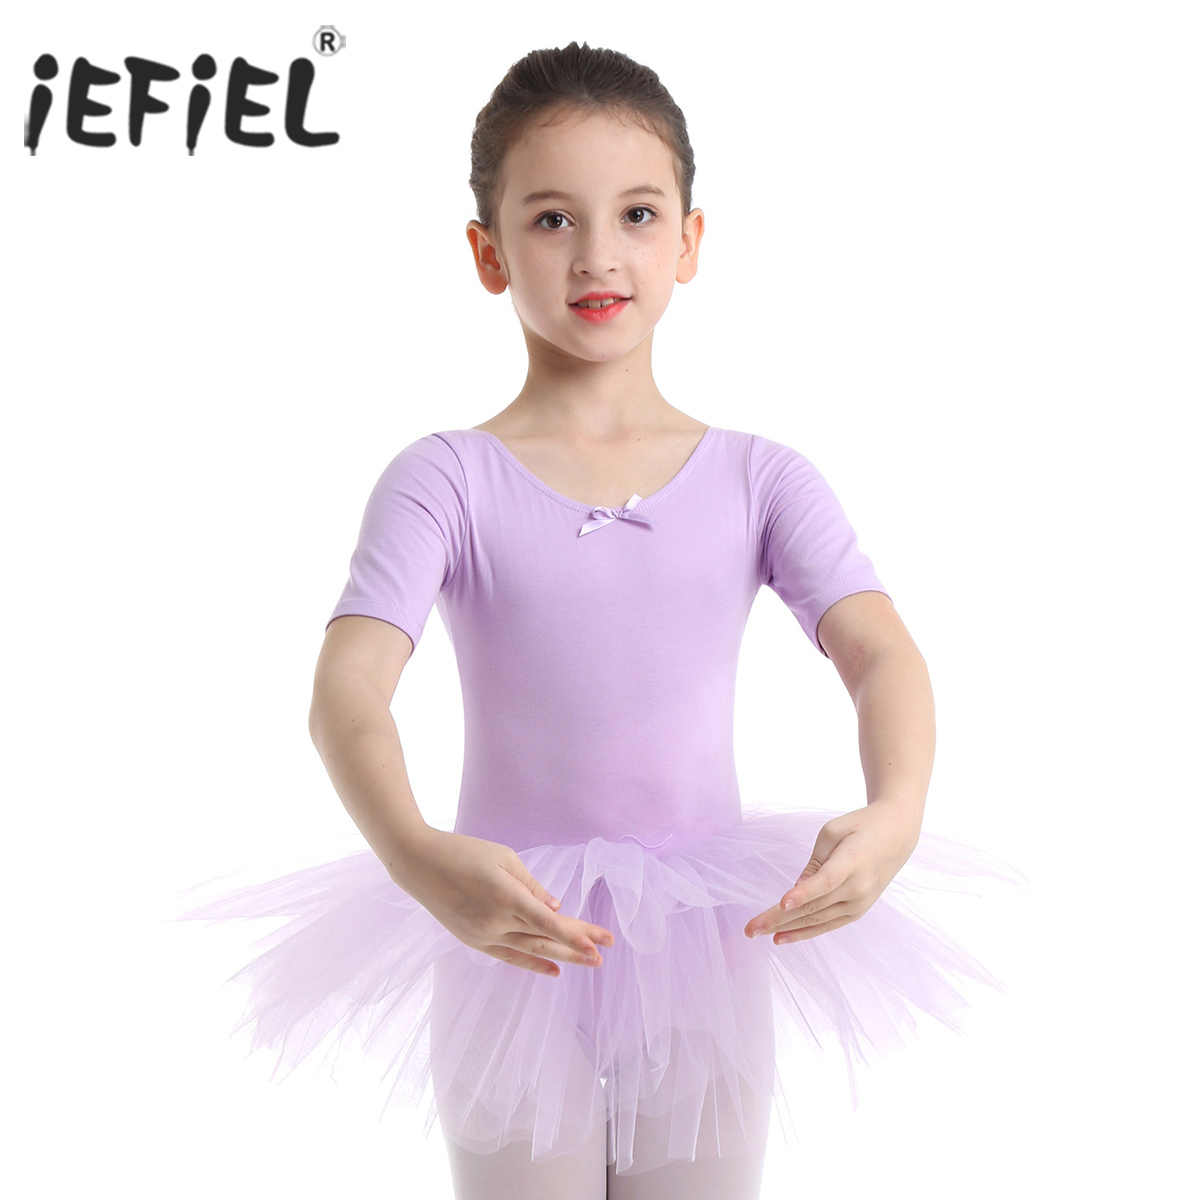 29486b768 IEFiEL Teen Kids Girls Party Tulle Ballet Dance Wear gimnasia ...